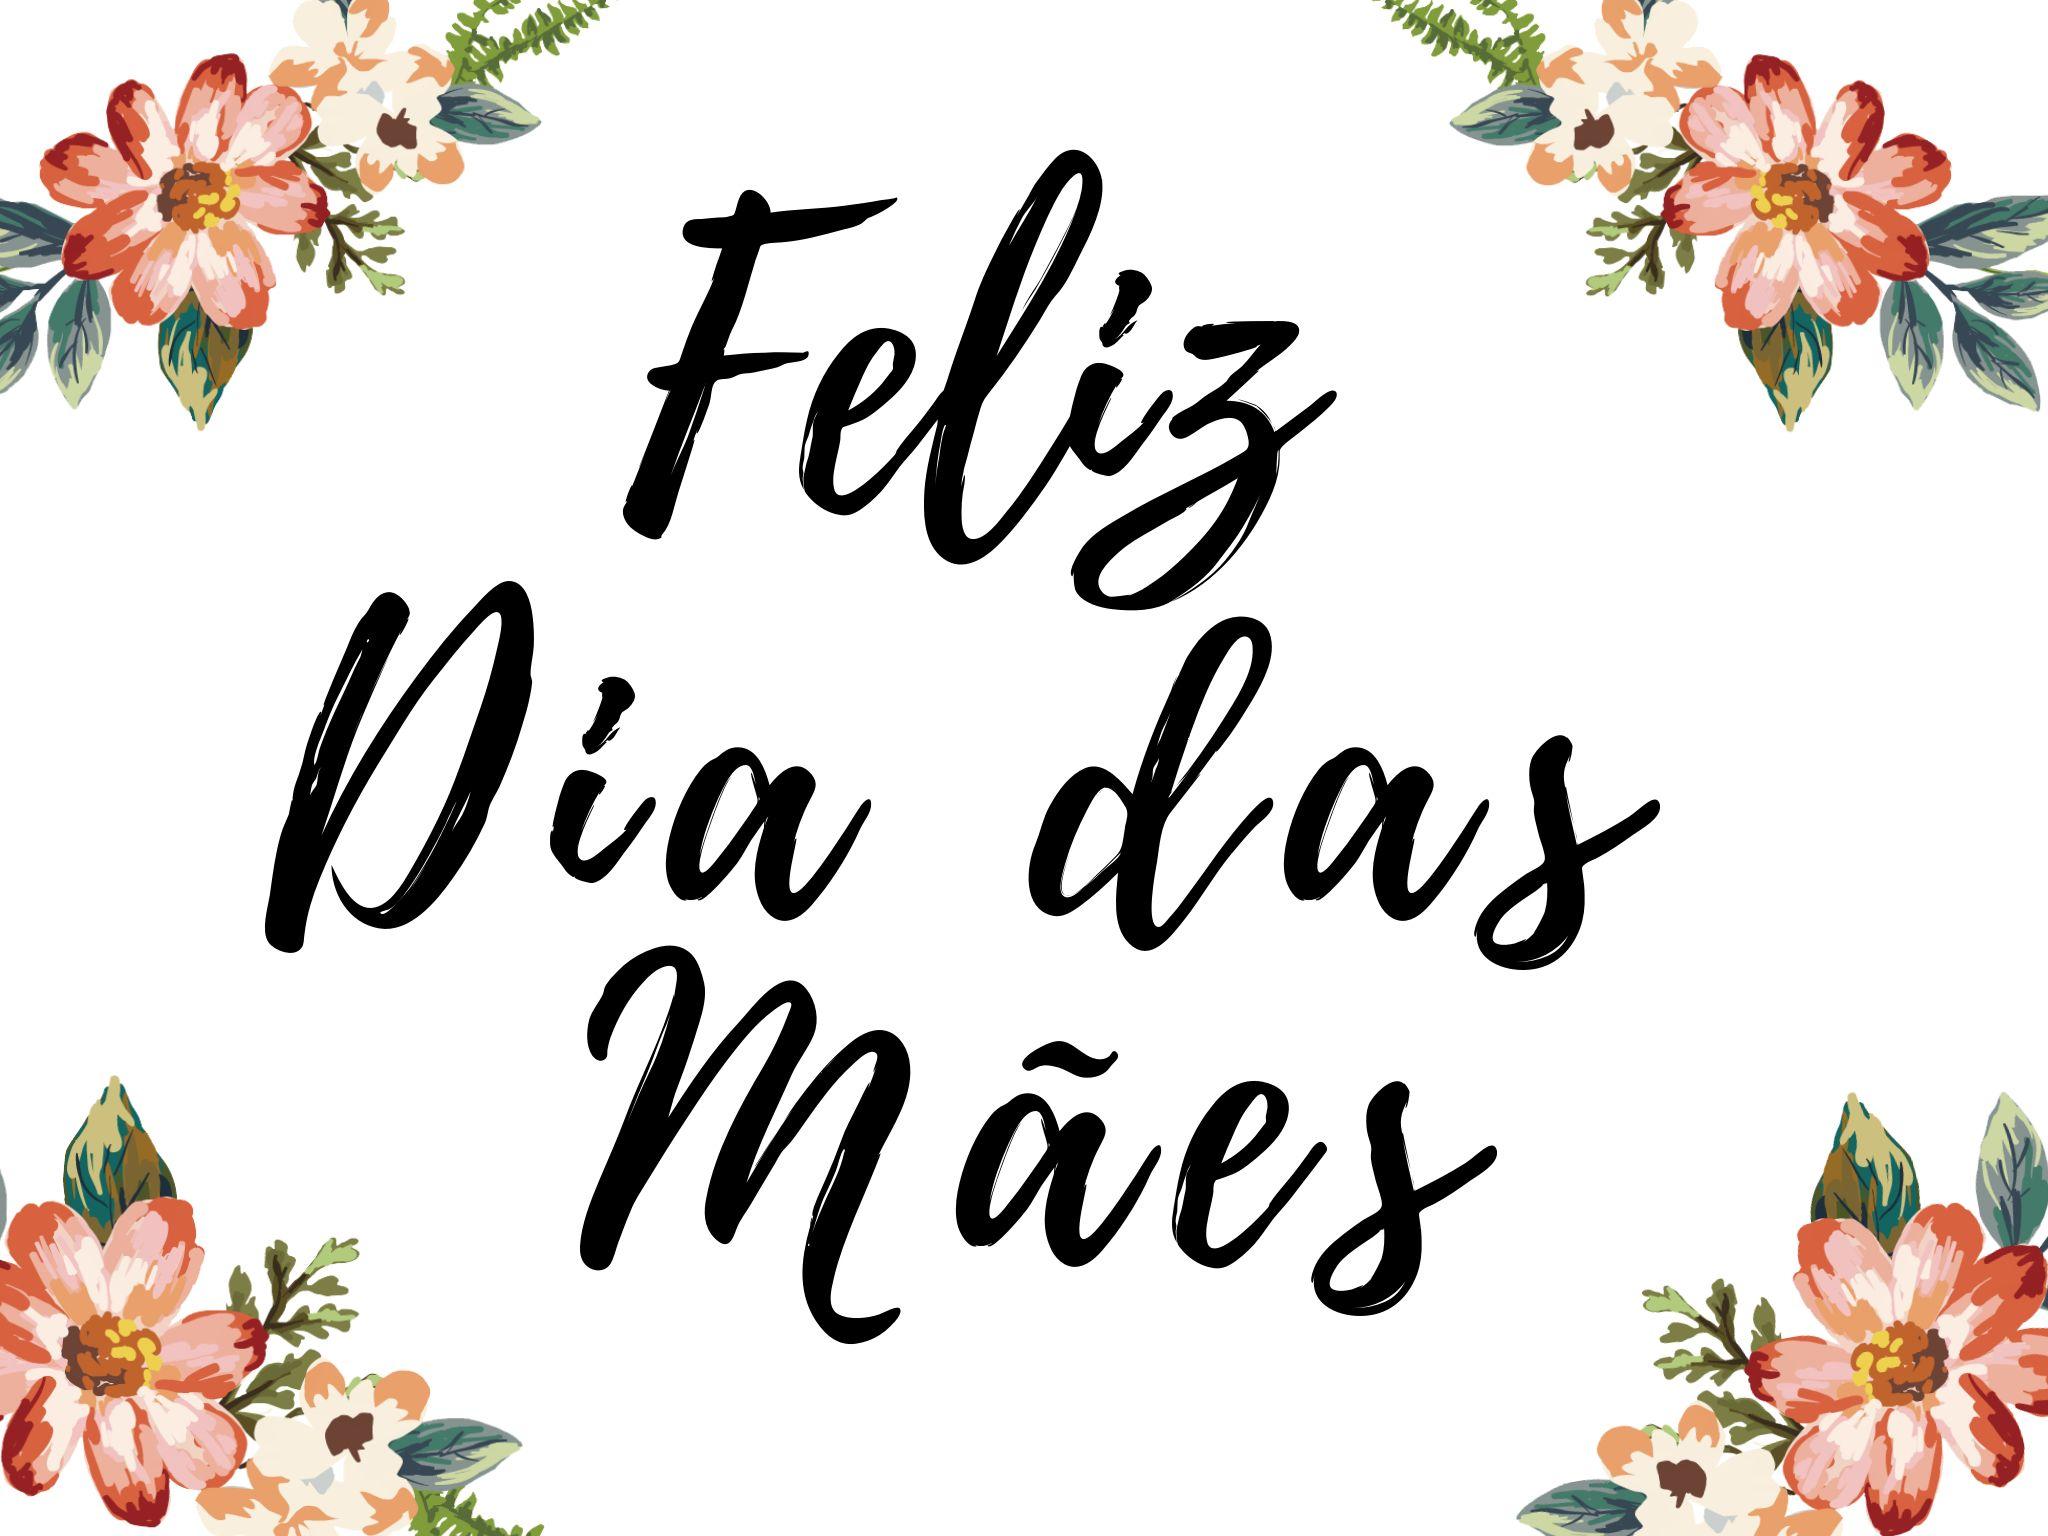 Cartao Dia Das Maes Card Cartao Diadasmaes Maes Amor